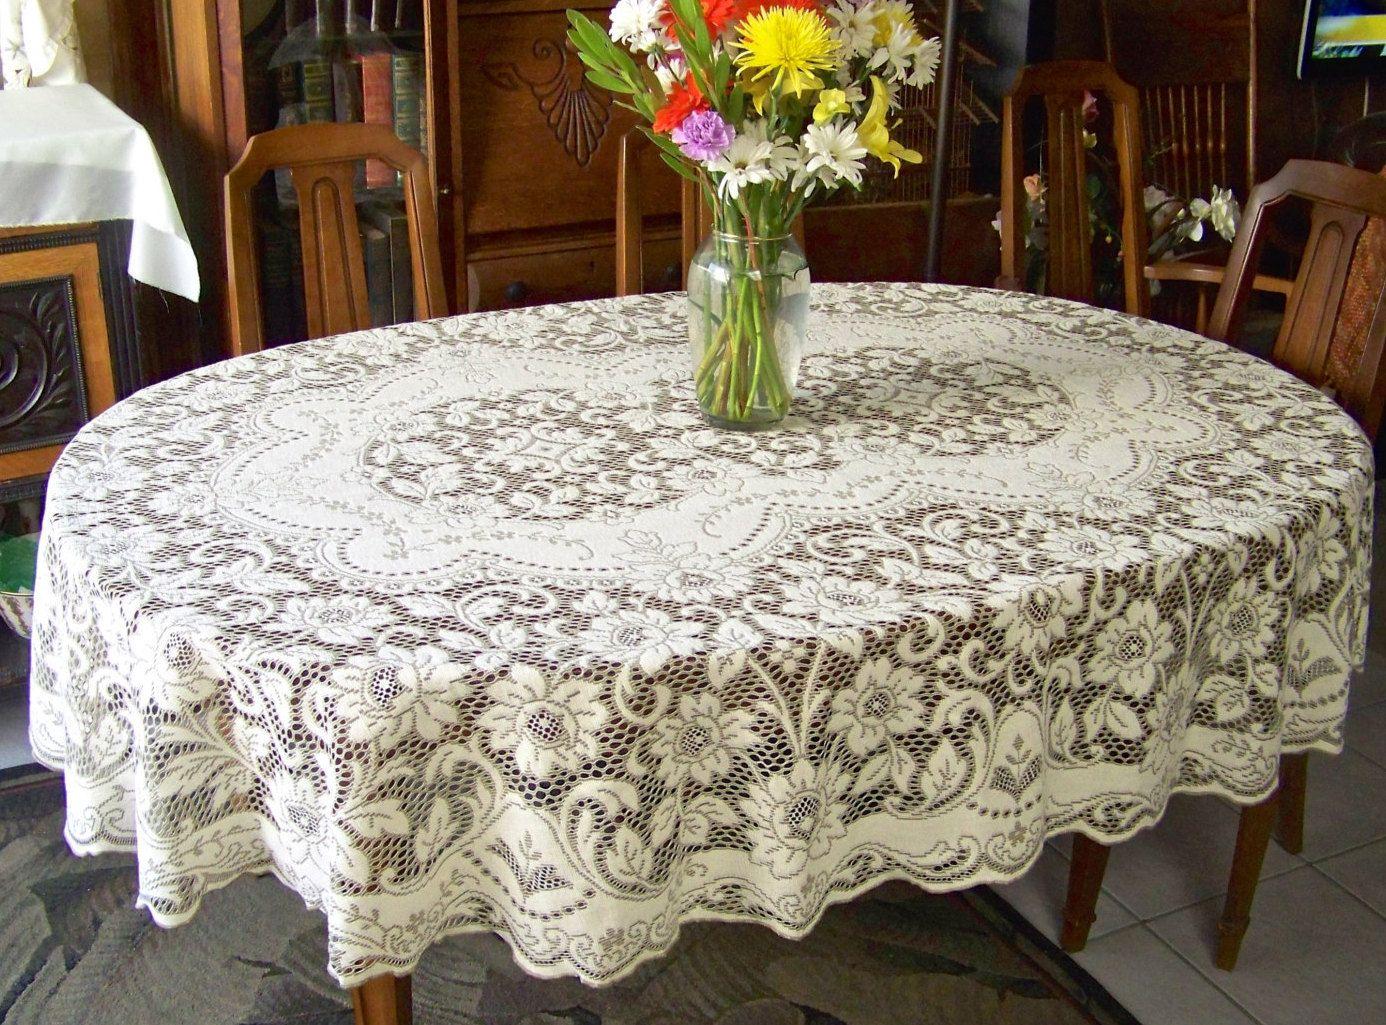 Vintage Quaker Lace Cloth Oval Tablecloth Cottage Decor Table